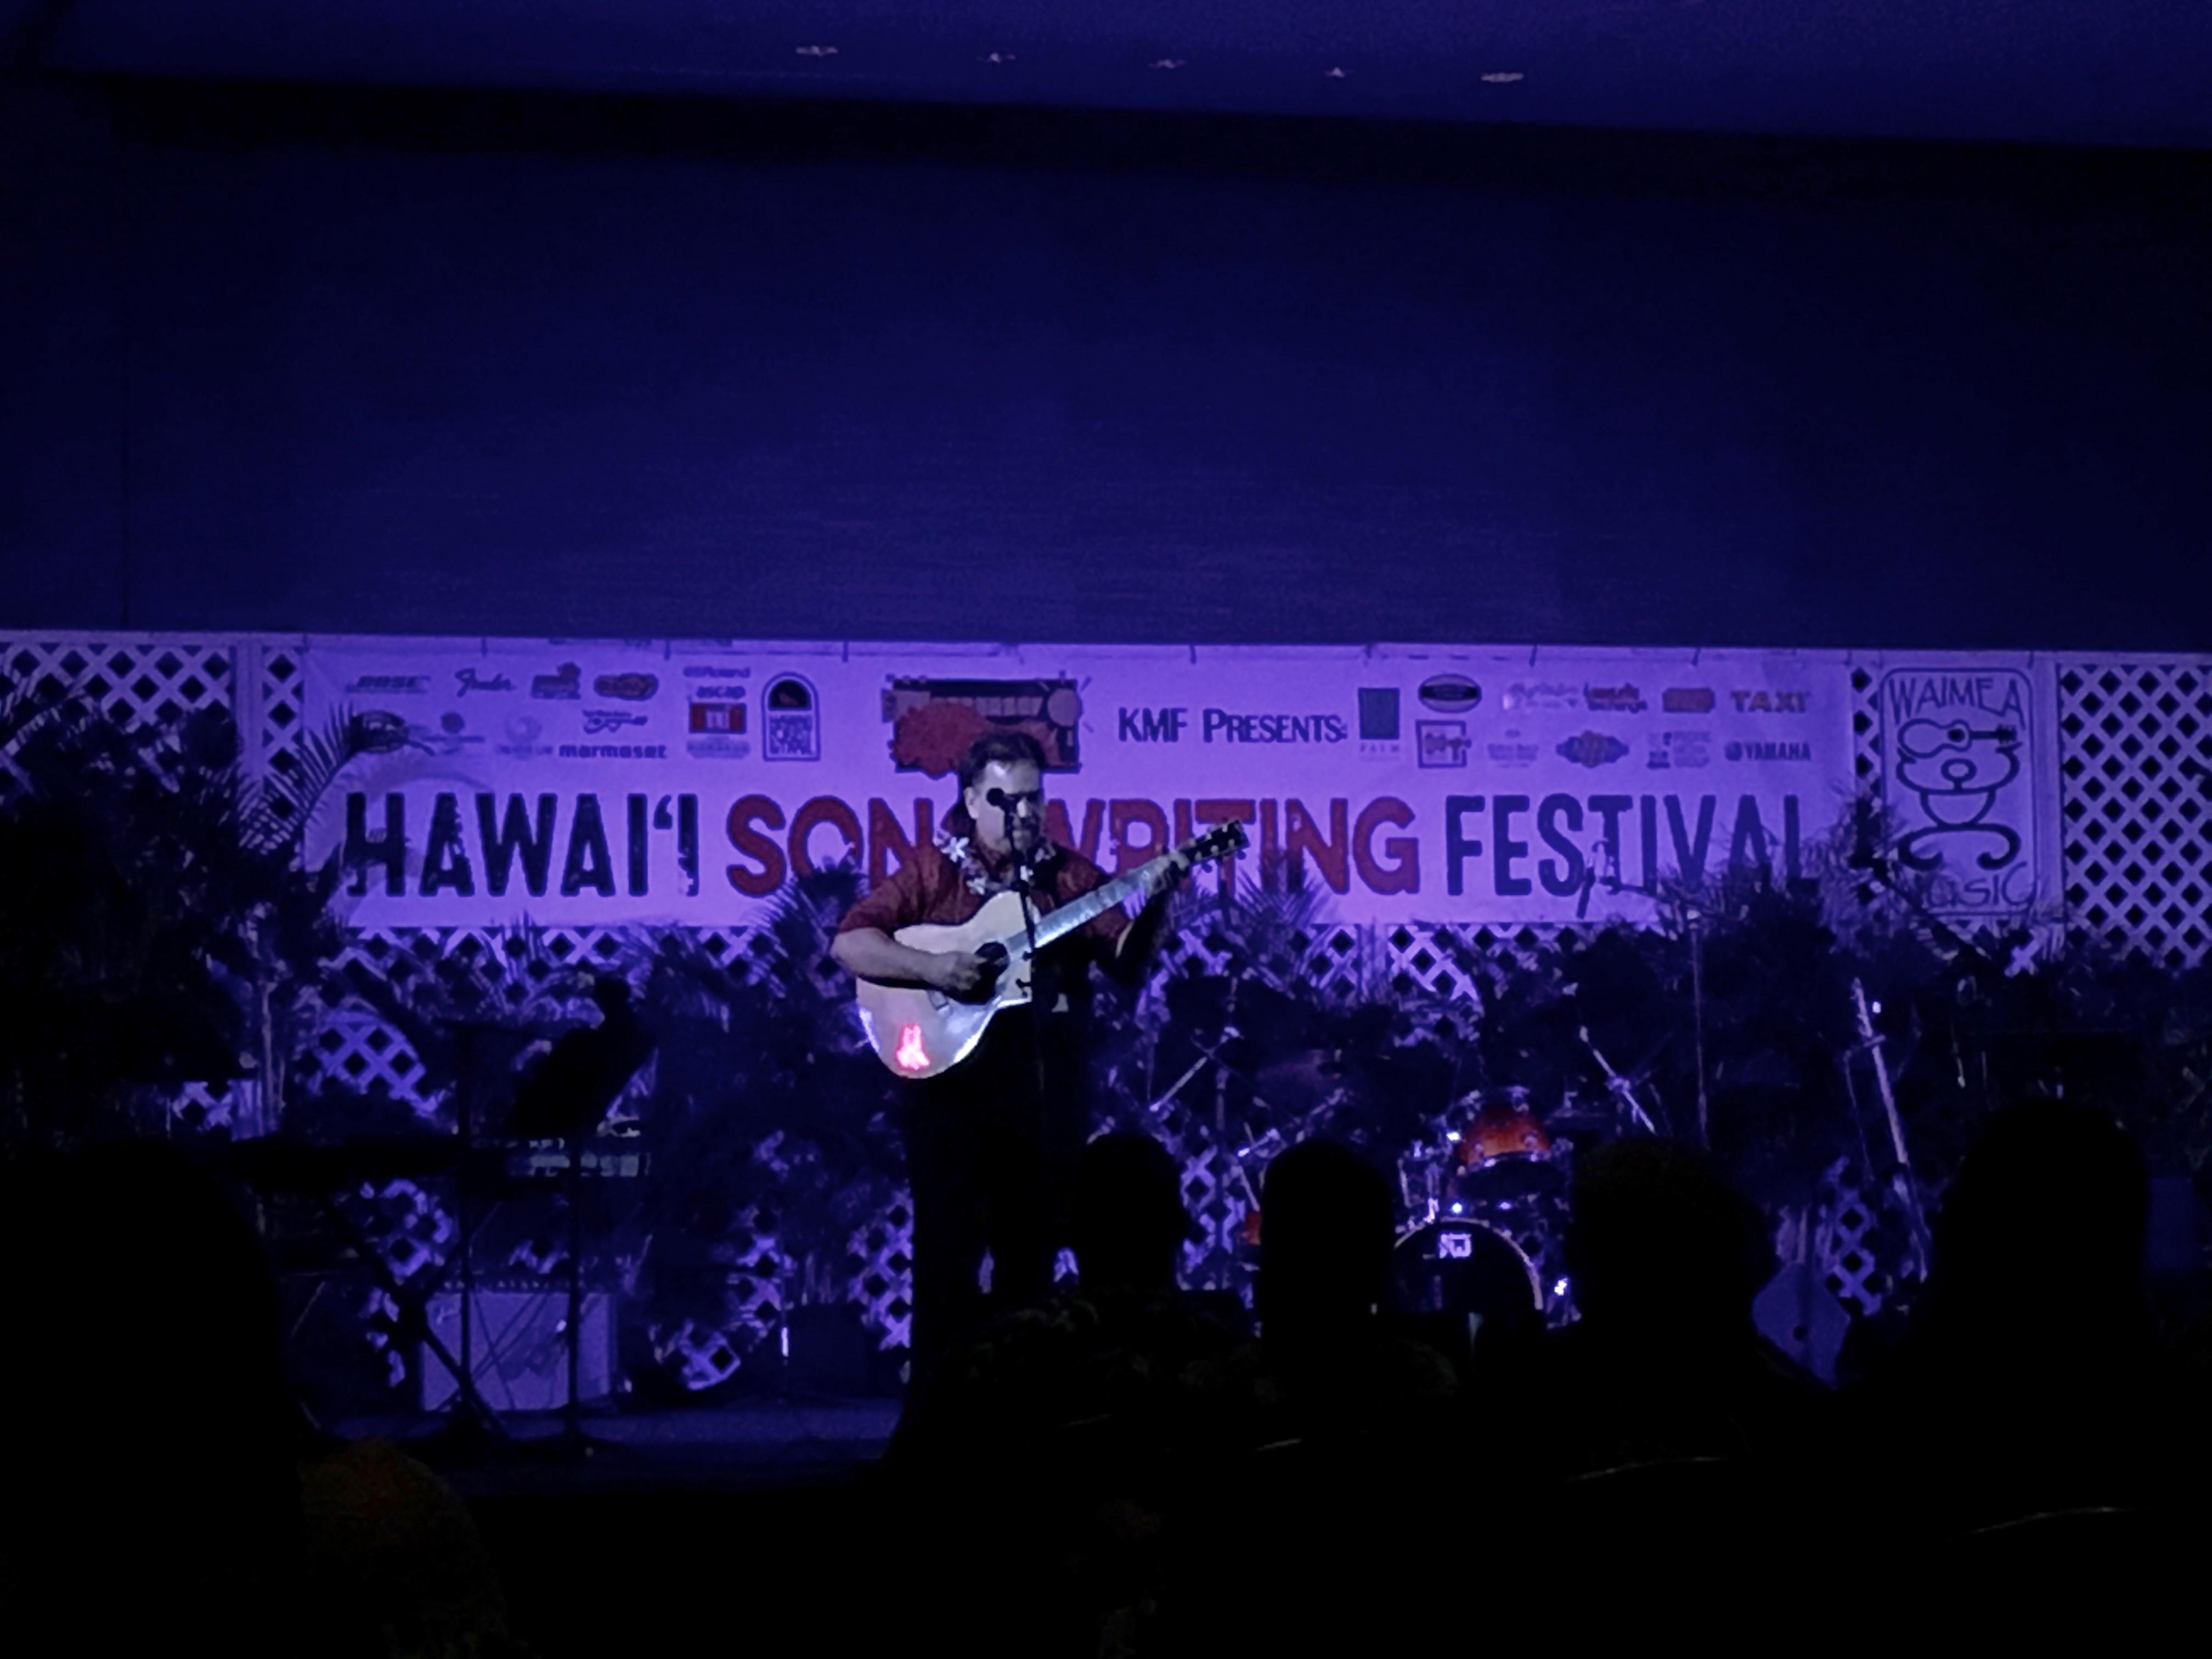 blog_son_hawaii_songwriting_festiva